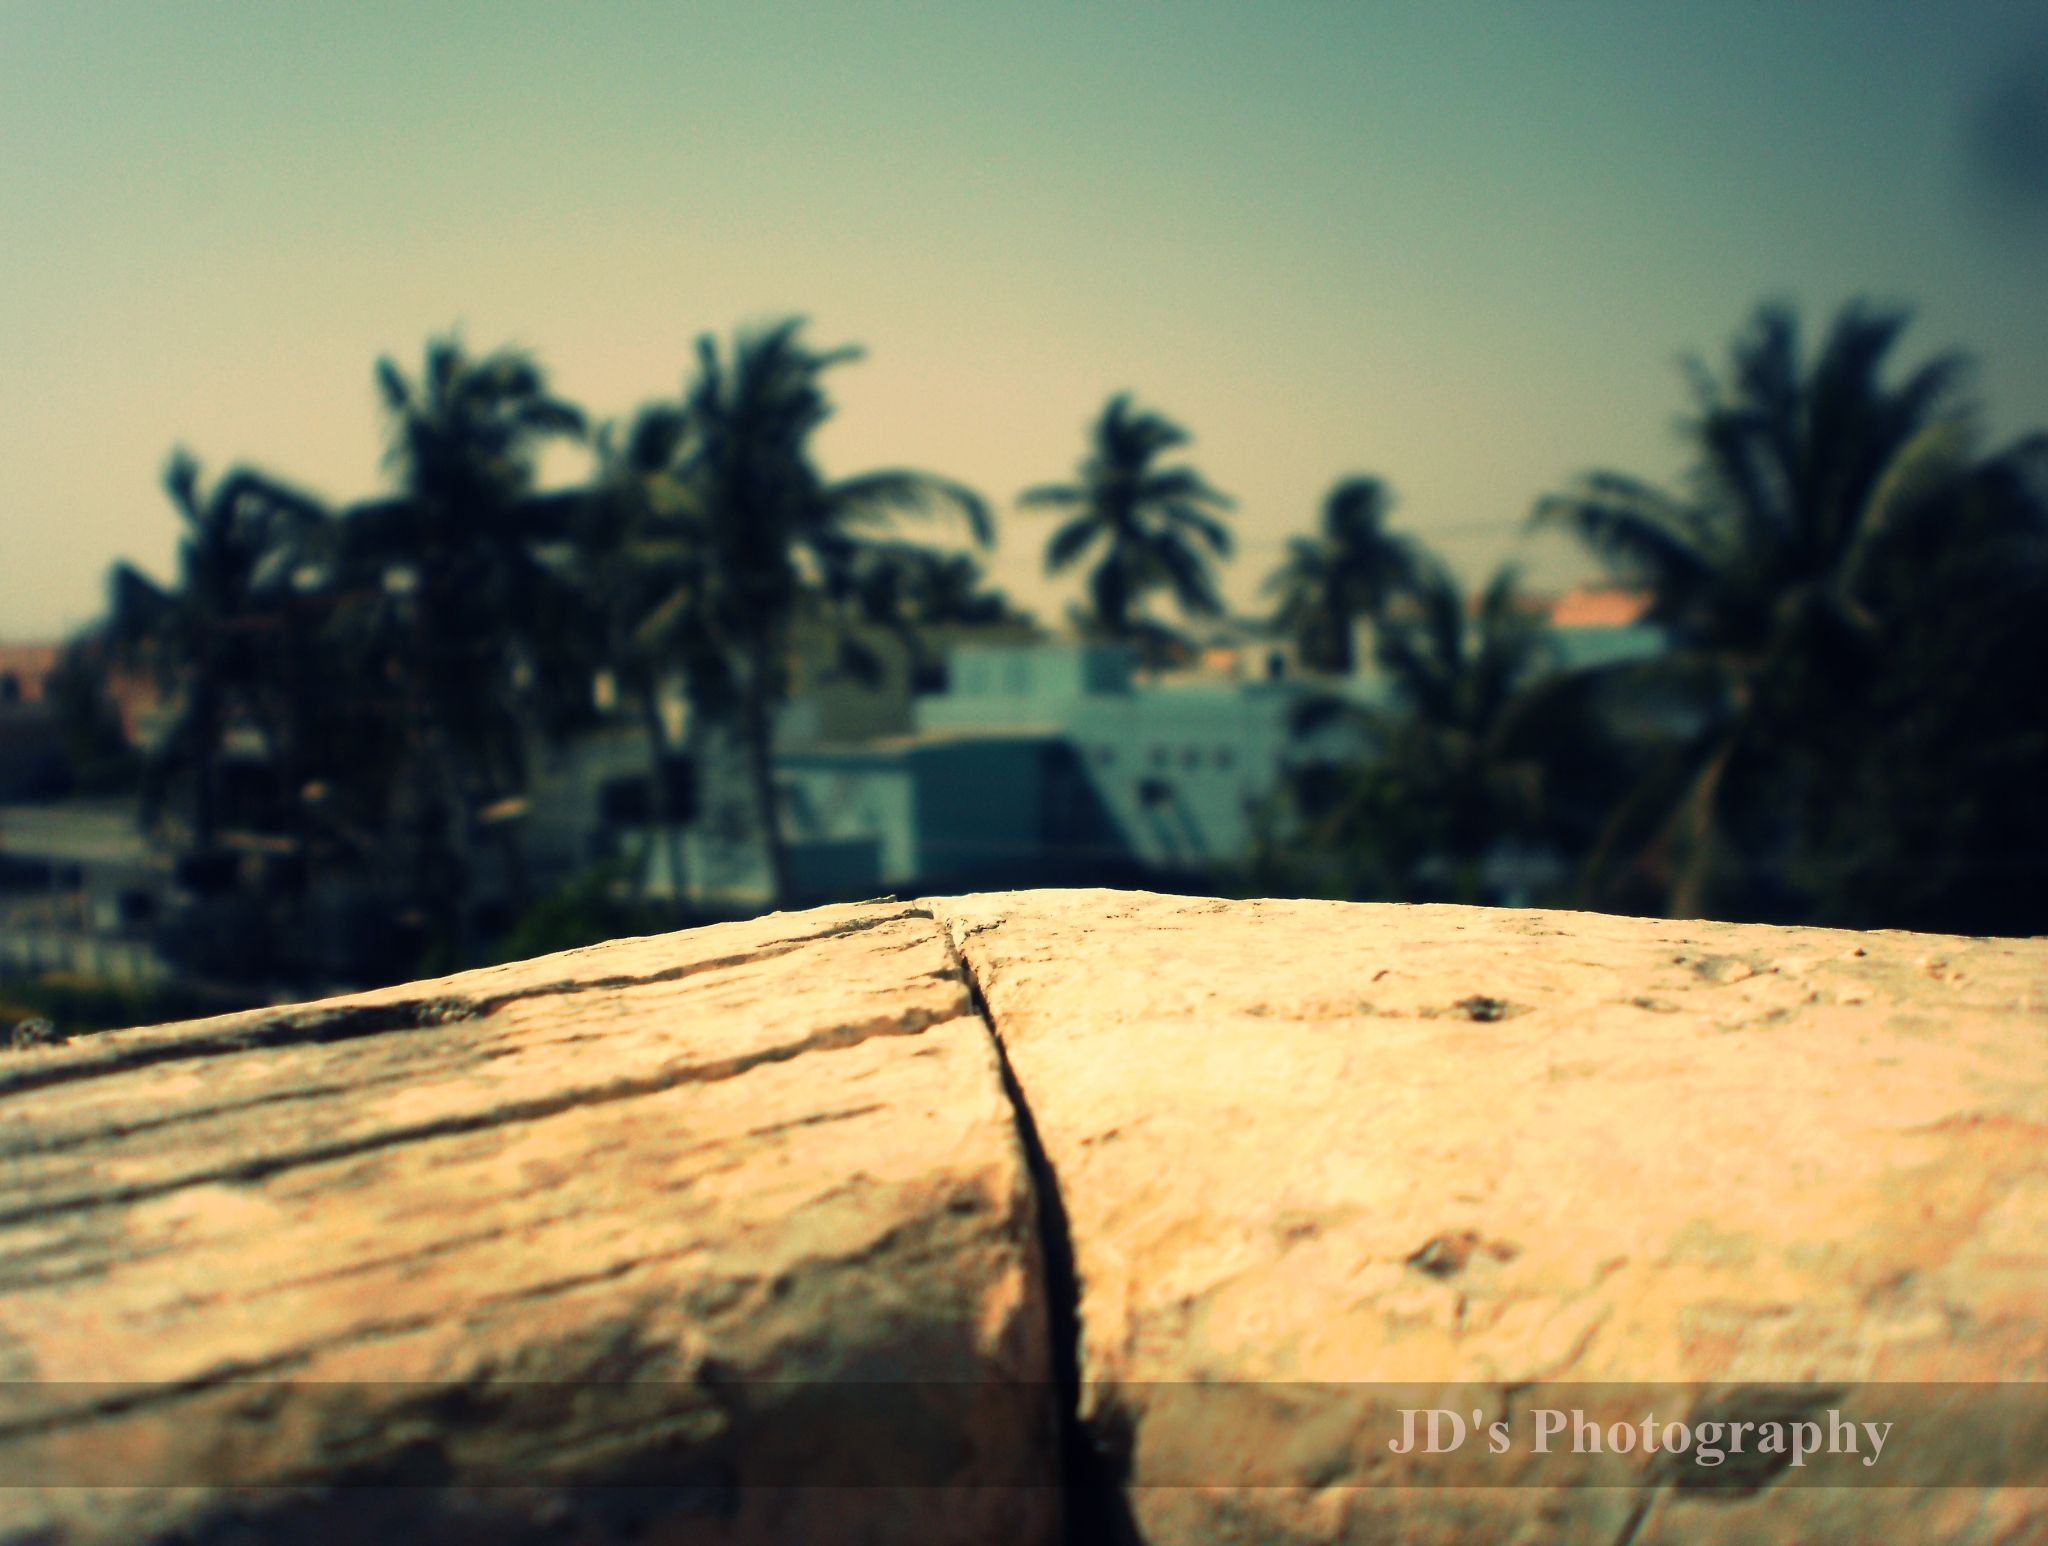 JD's Photography . by jawwad.khalil.16